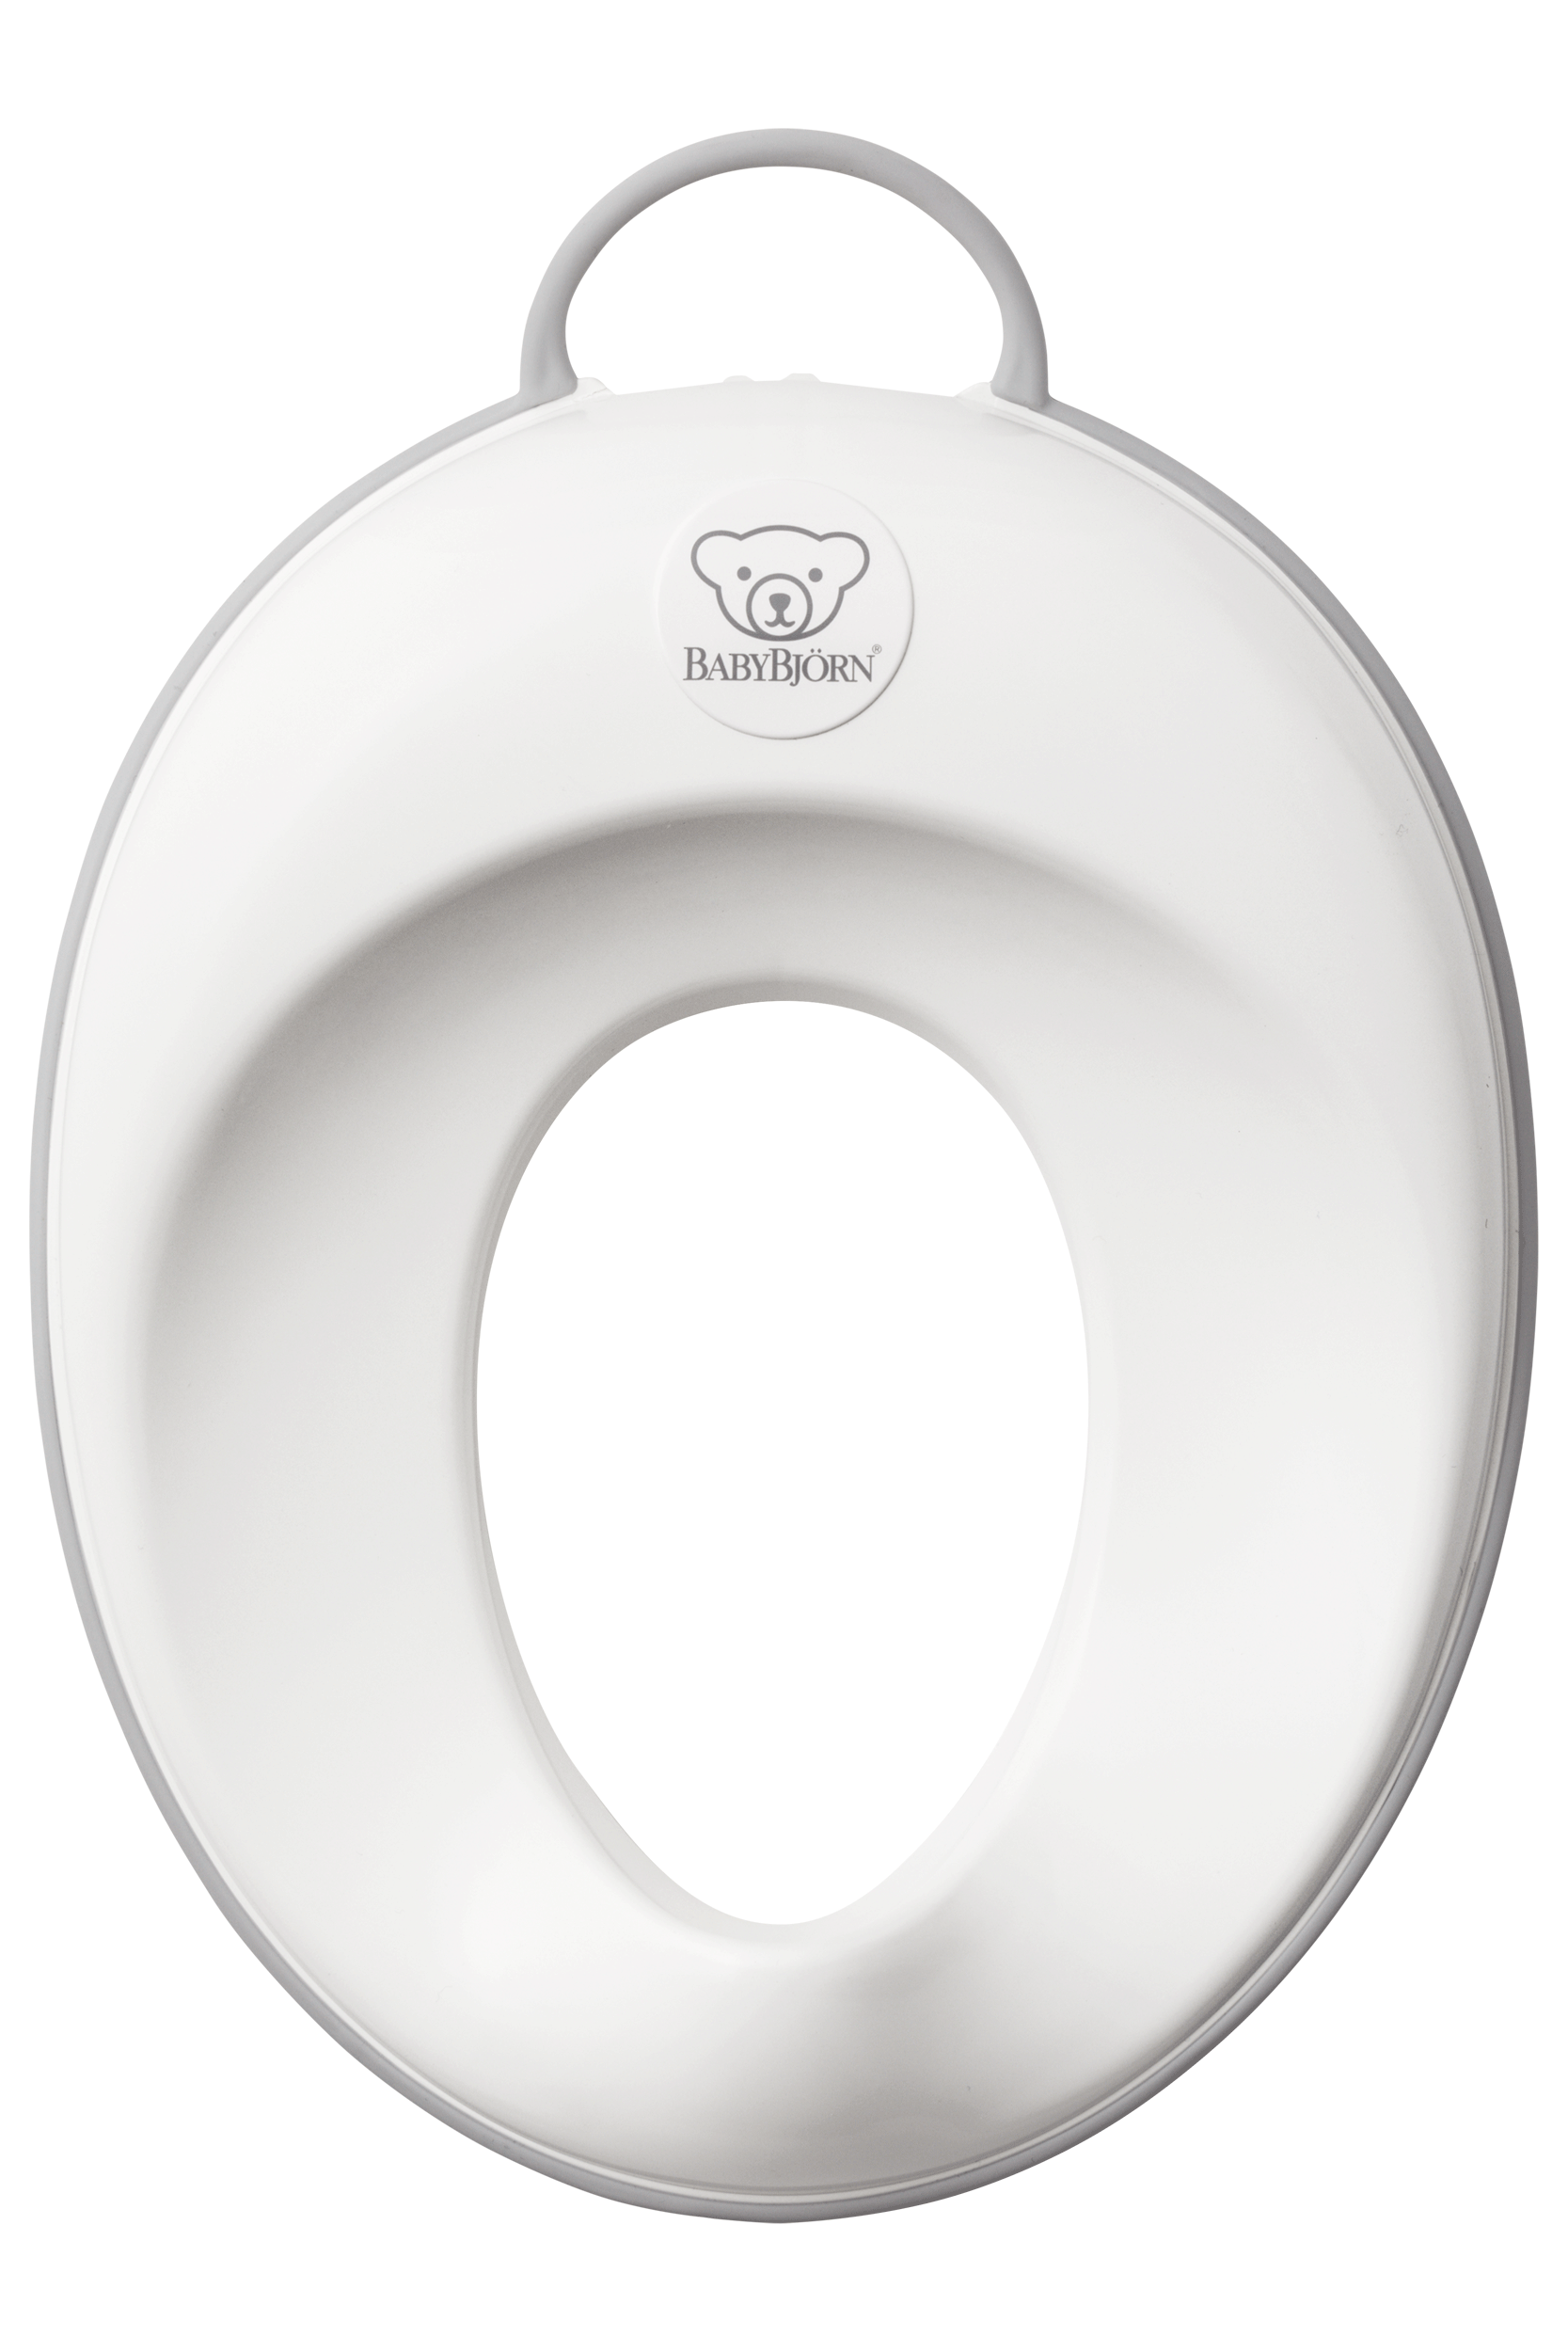 BABYBJÖRN Toilettensitz - Weiß/Grau